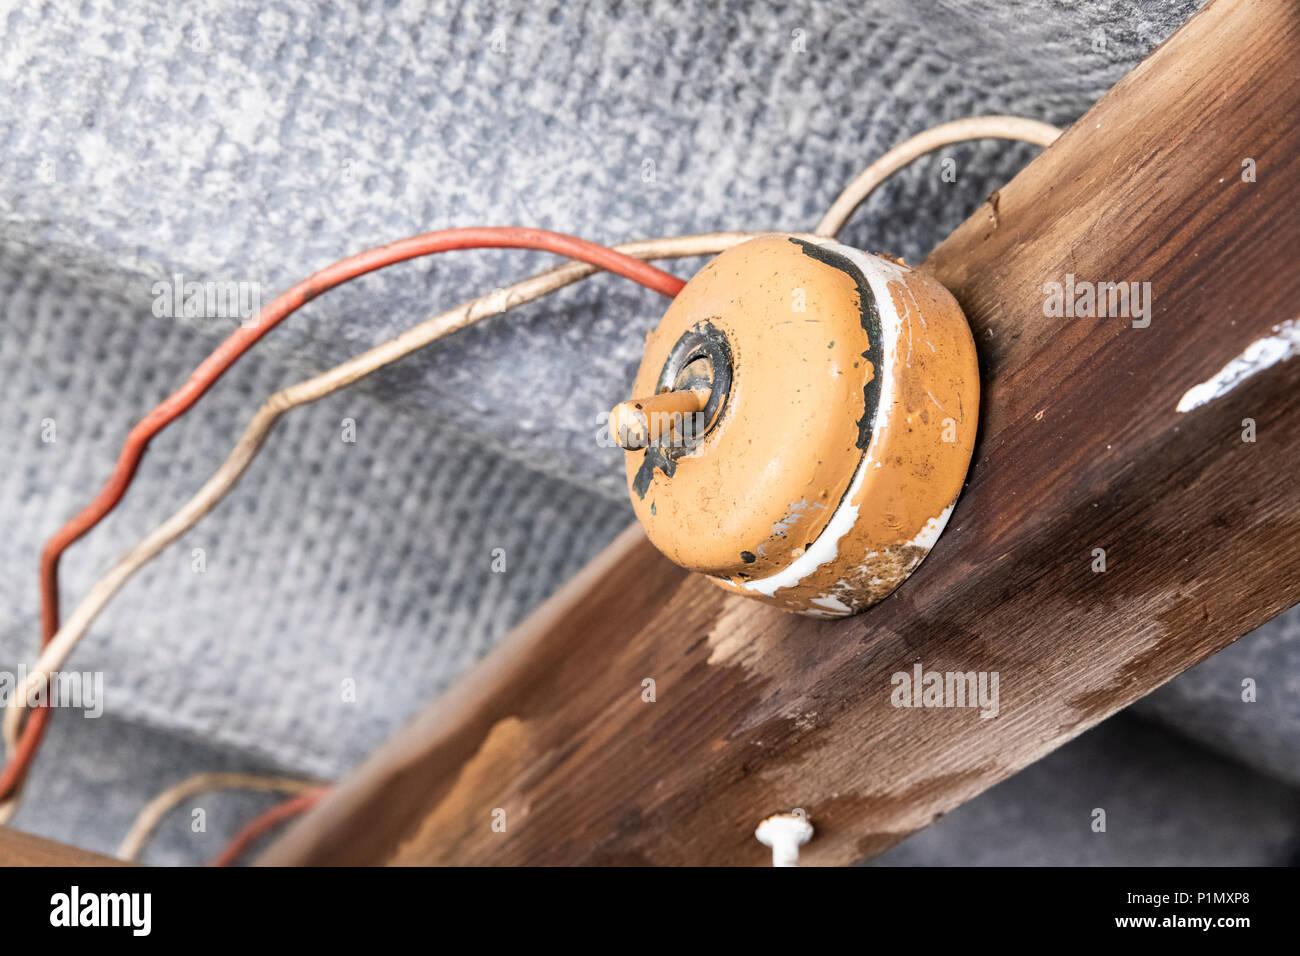 Dangerous Wiring Stockfotos & Dangerous Wiring Bilder - Alamy